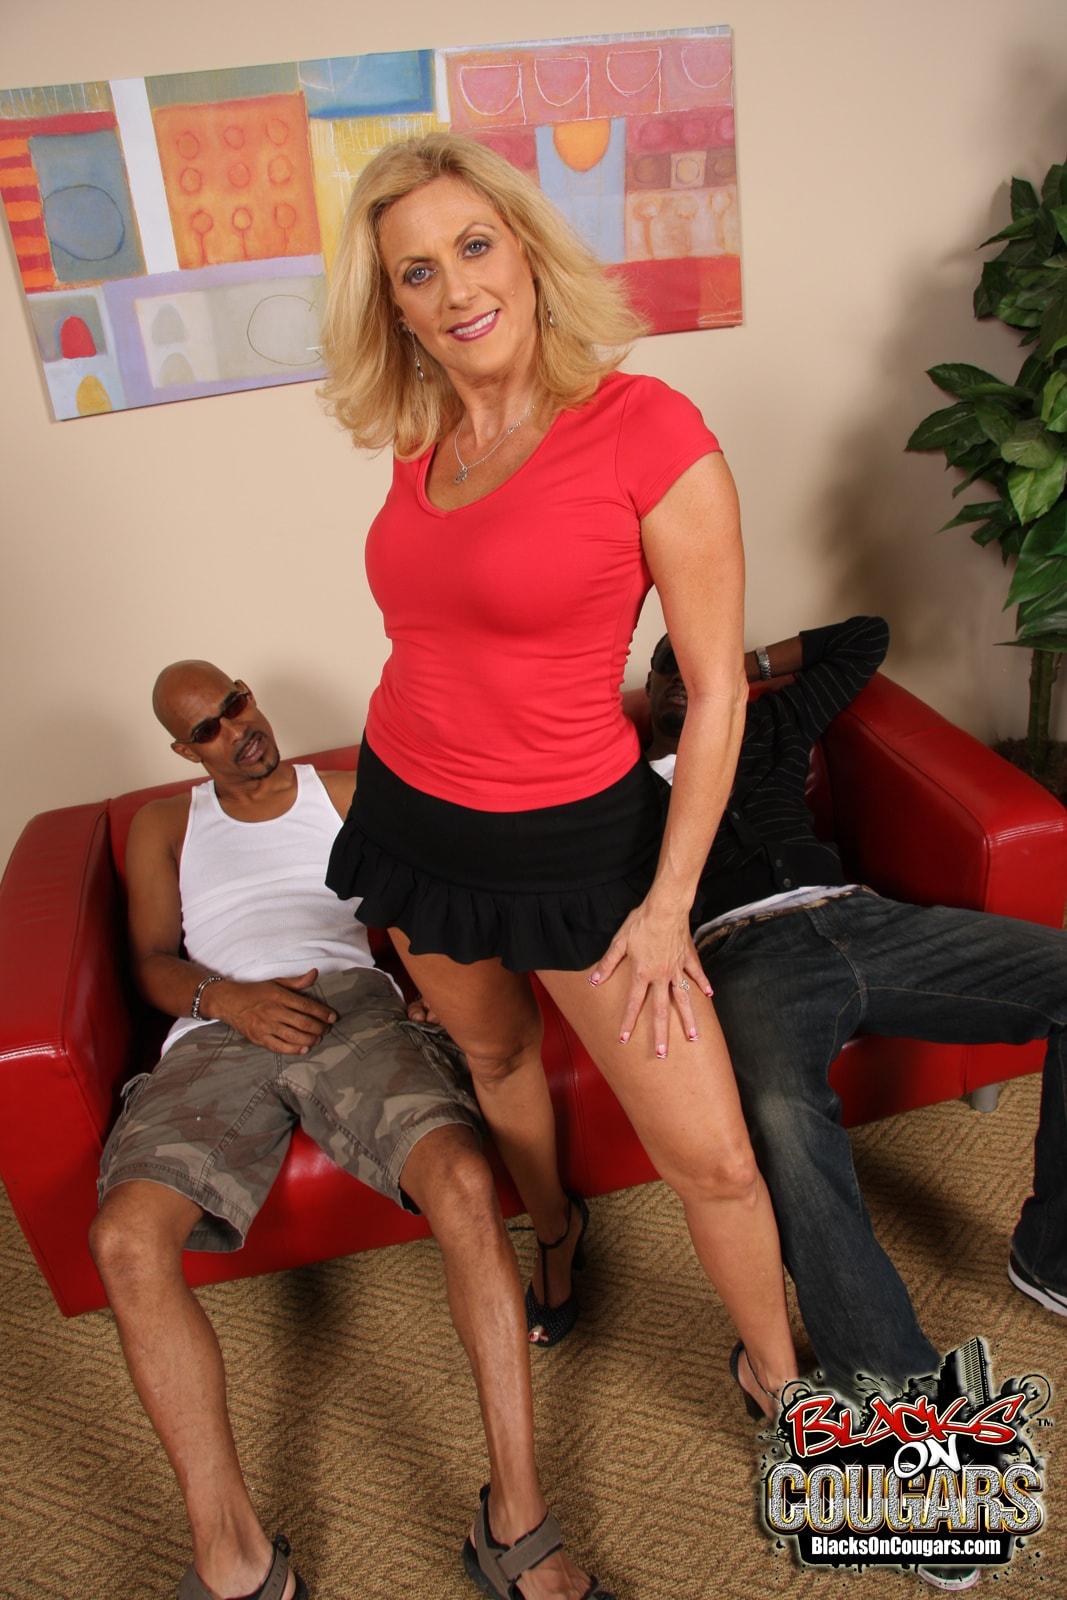 Dogfart '- Blacks On Cougars' starring Dana Devine (Photo 6)